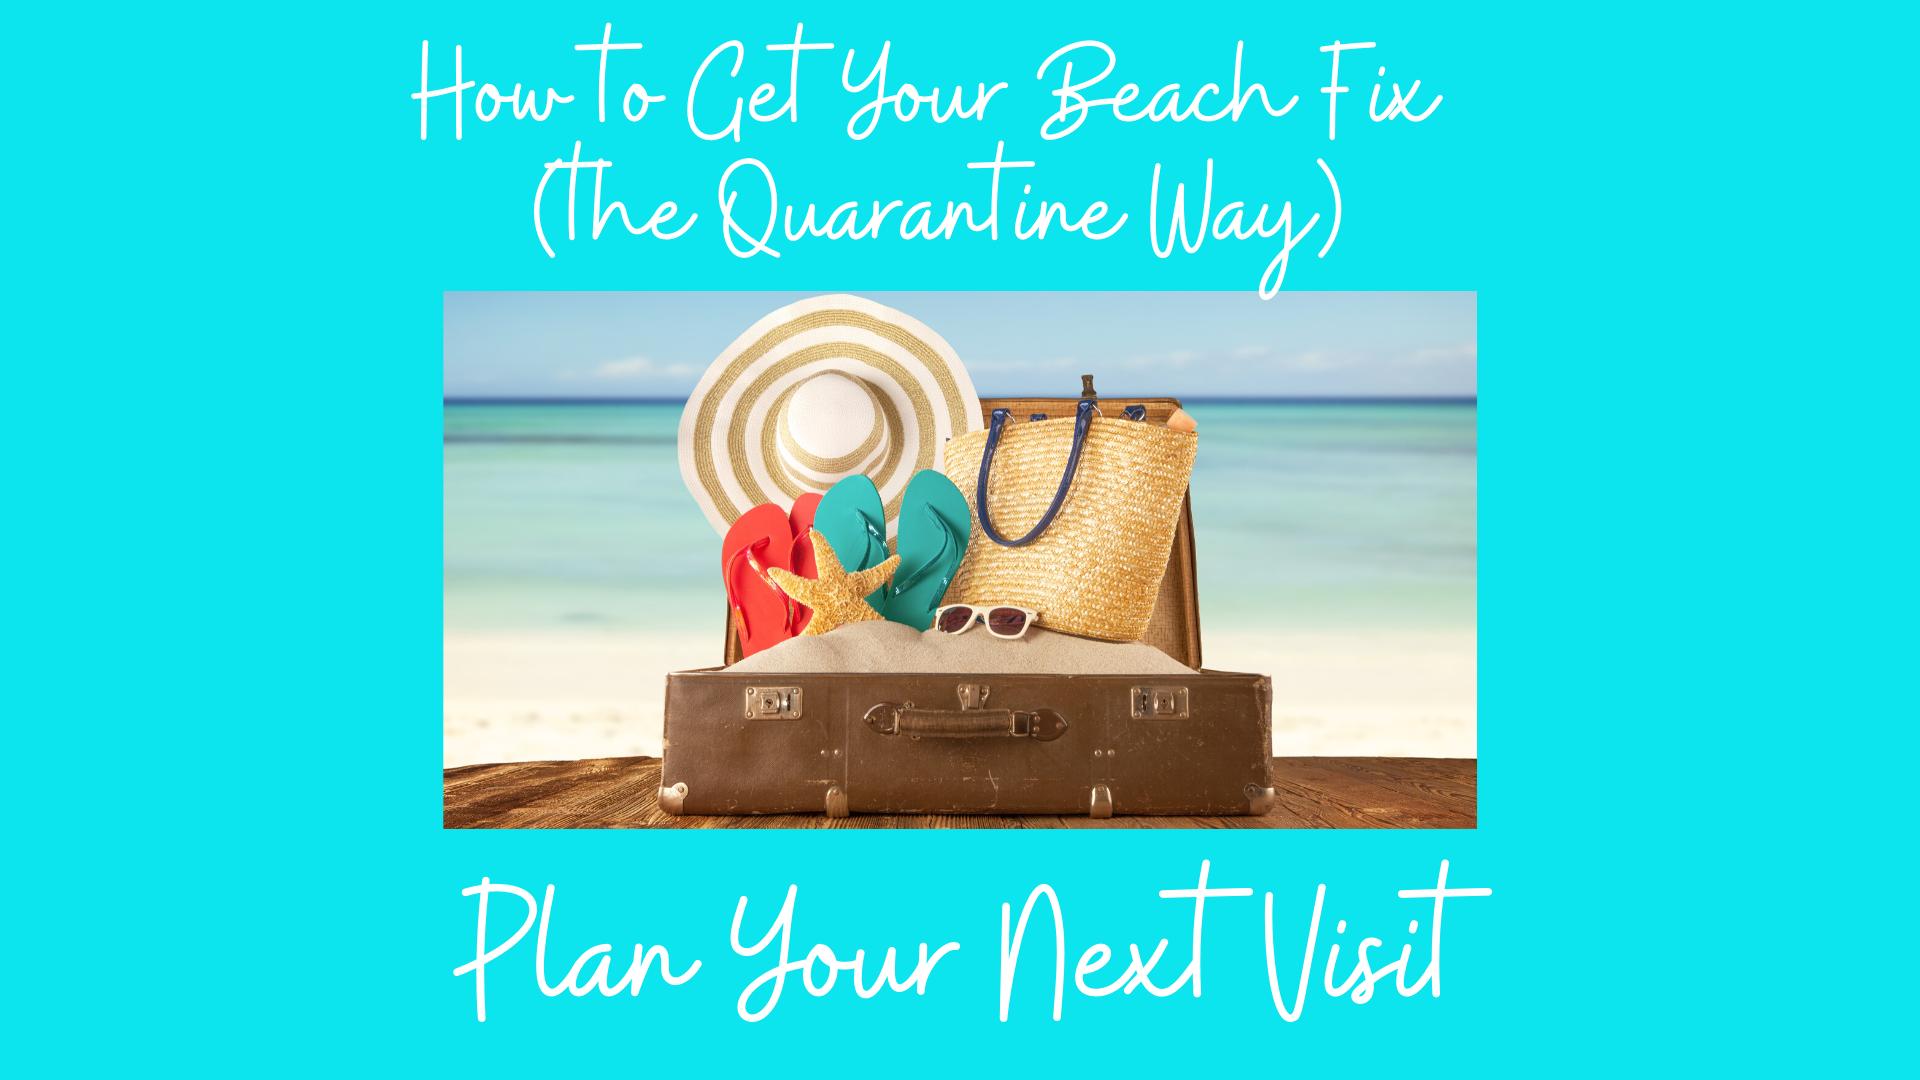 14 Ways to Get Your Beach Fix (the Quarantine Way) #2 Plan Your Next Trip